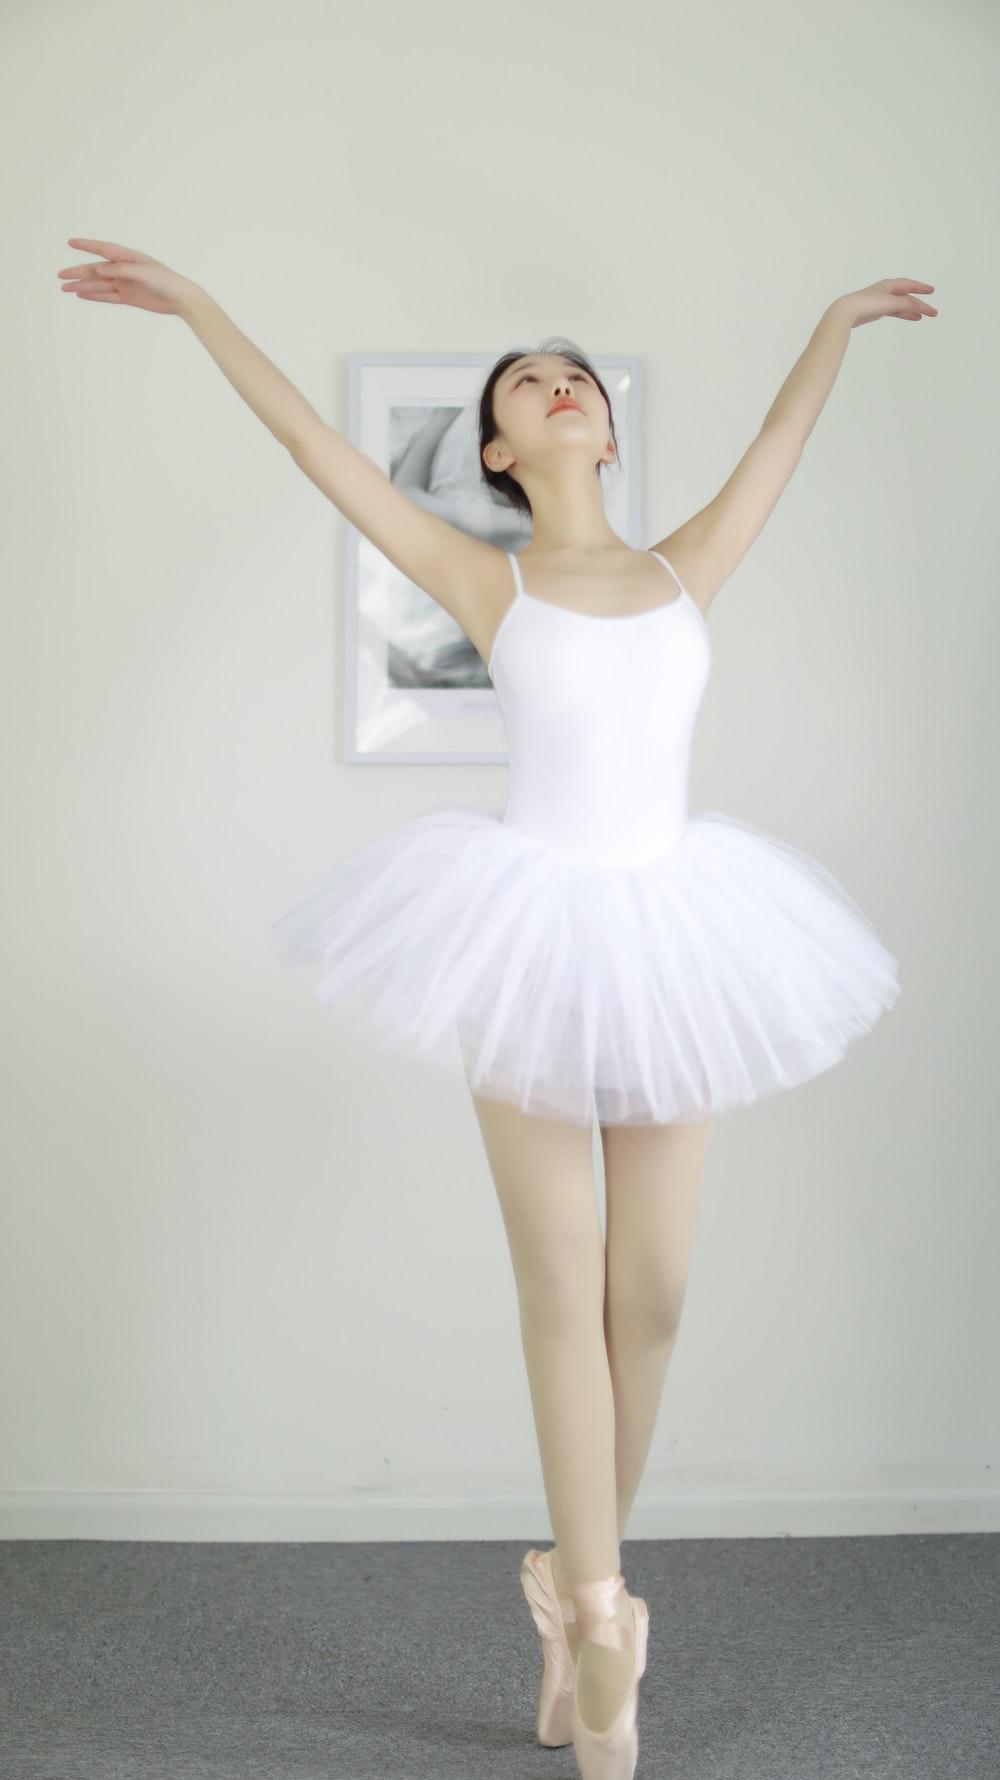 woman wearing white ballerina dress